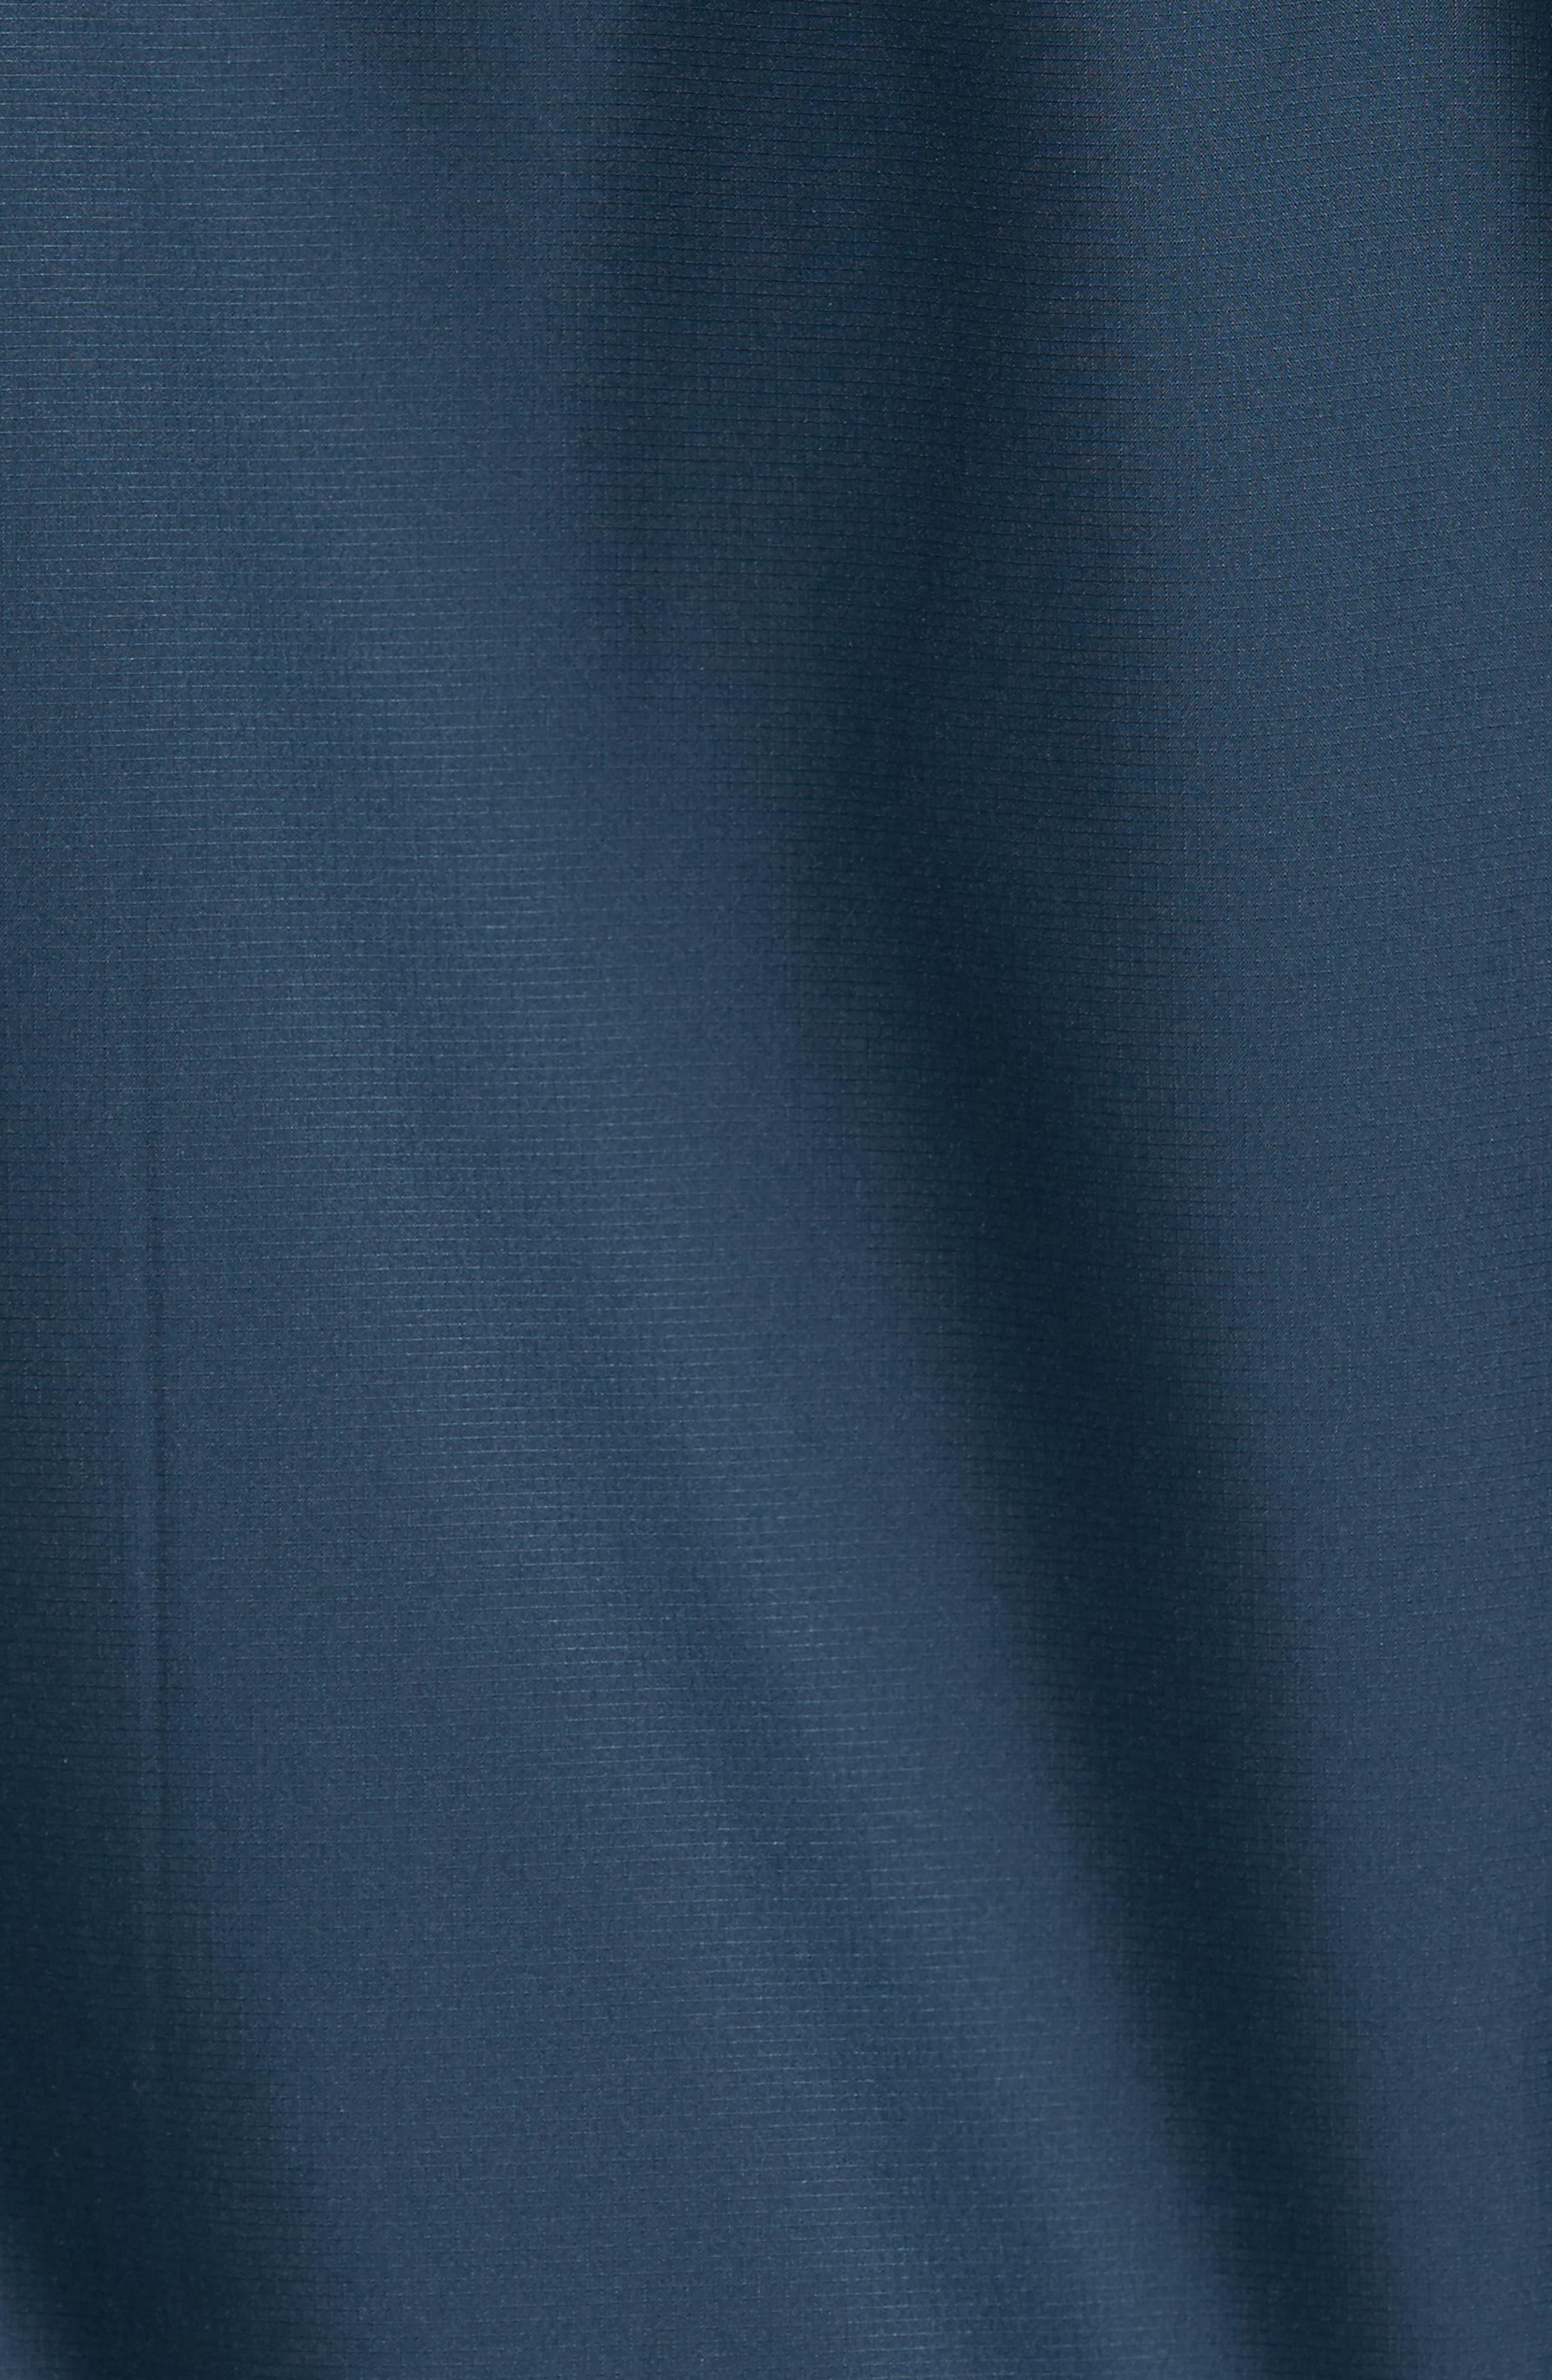 'Windrunner' Colorblock Jacket,                             Alternate thumbnail 6, color,                             GREY/ BLUE